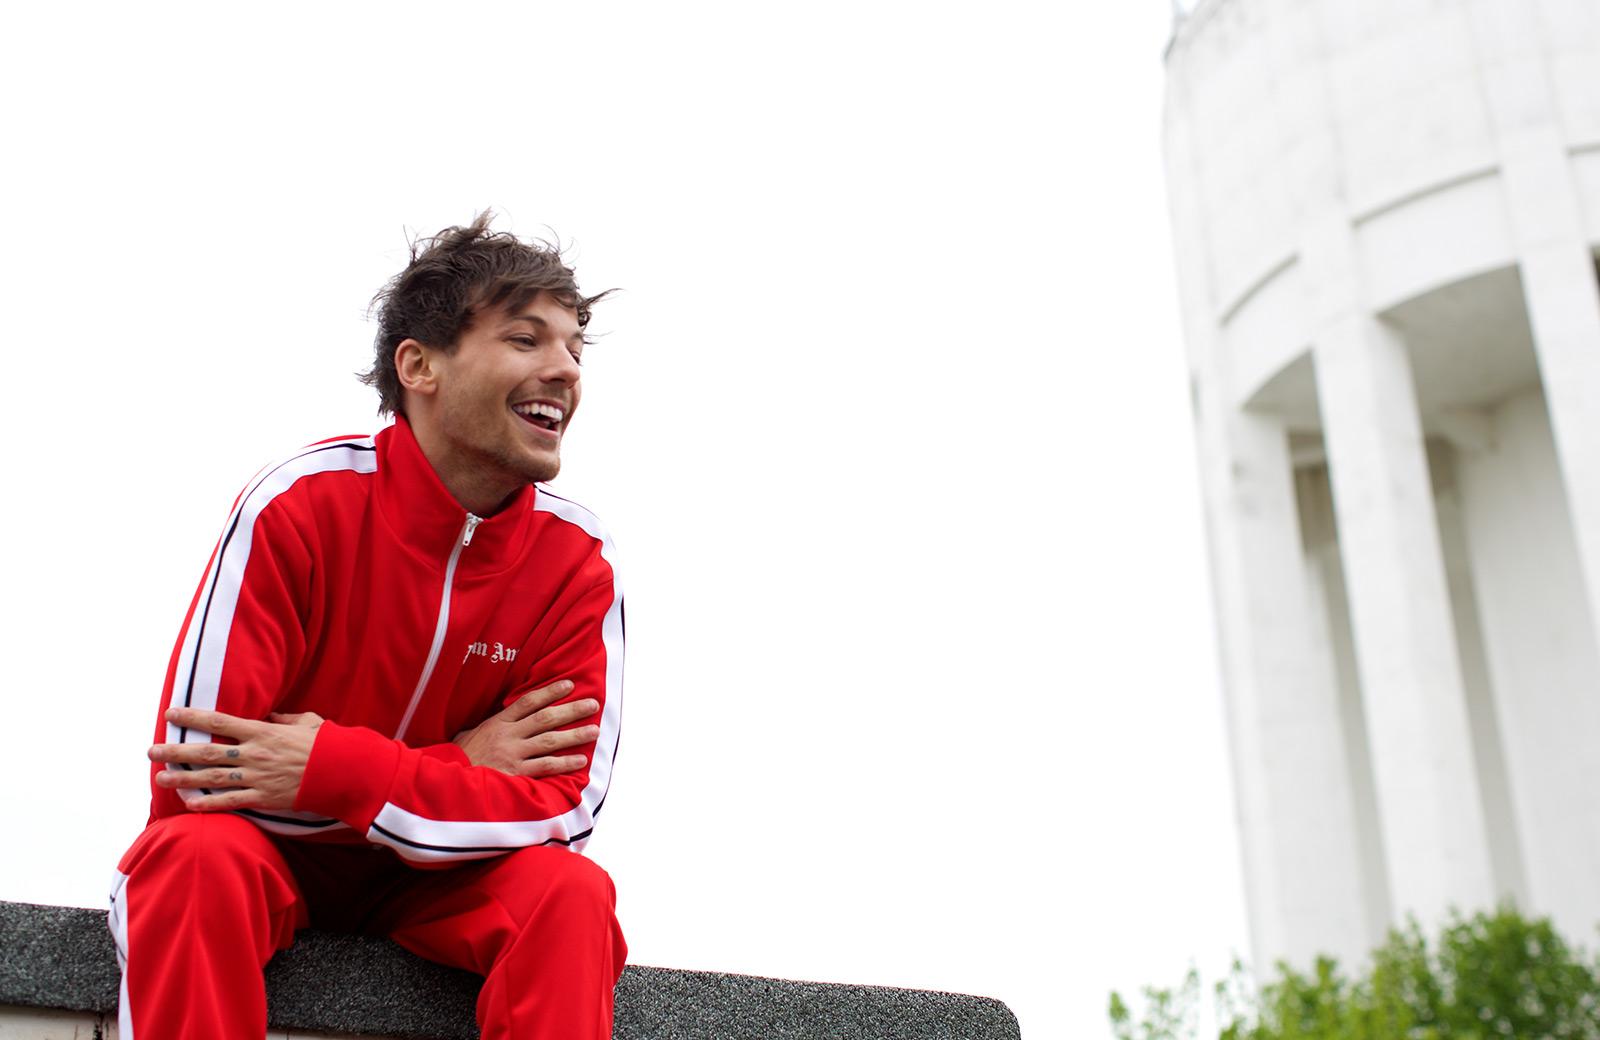 Louis Tomlinson News: Louis Tomlinson Announces New Single 'Back To You'